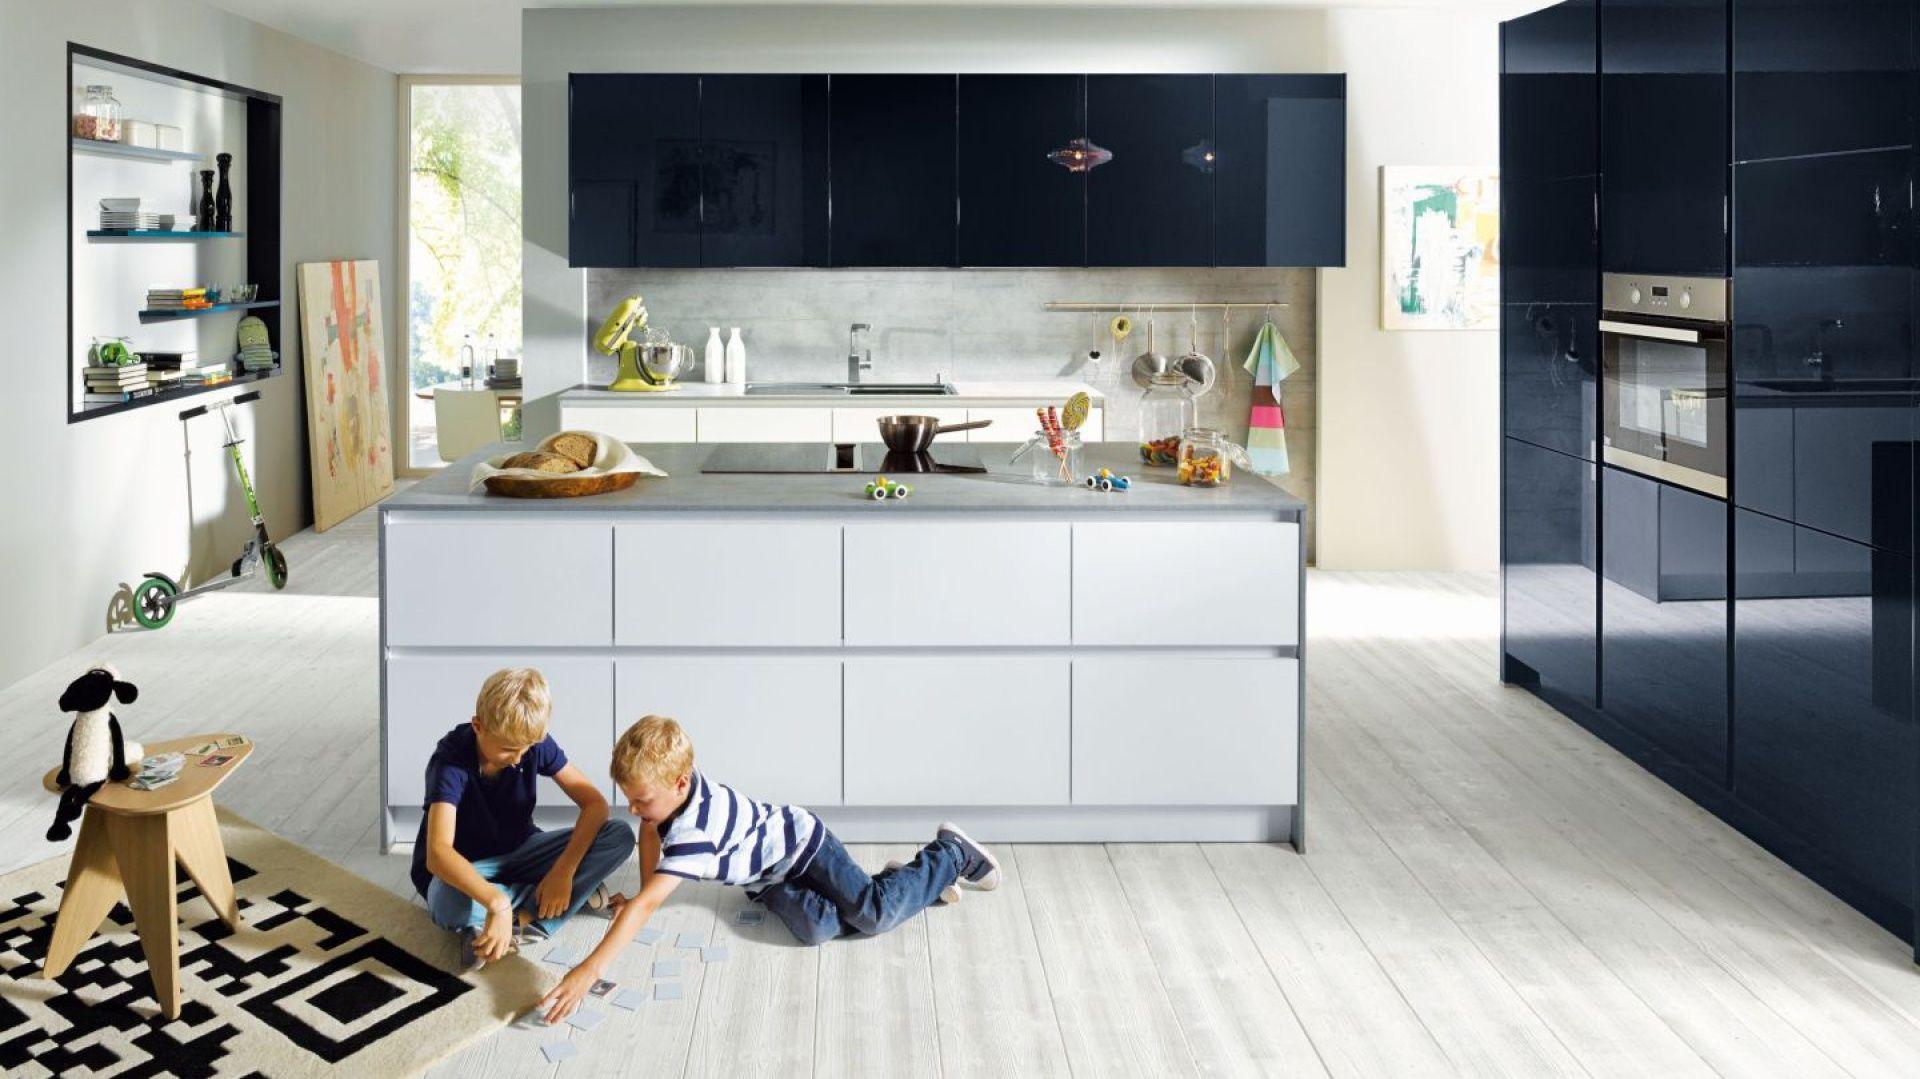 Modna Kuchnia Wybierz Meble Na Wysoki Polysk Sleek Kitchen Blue Kitchen Designs Handleless Kitchen